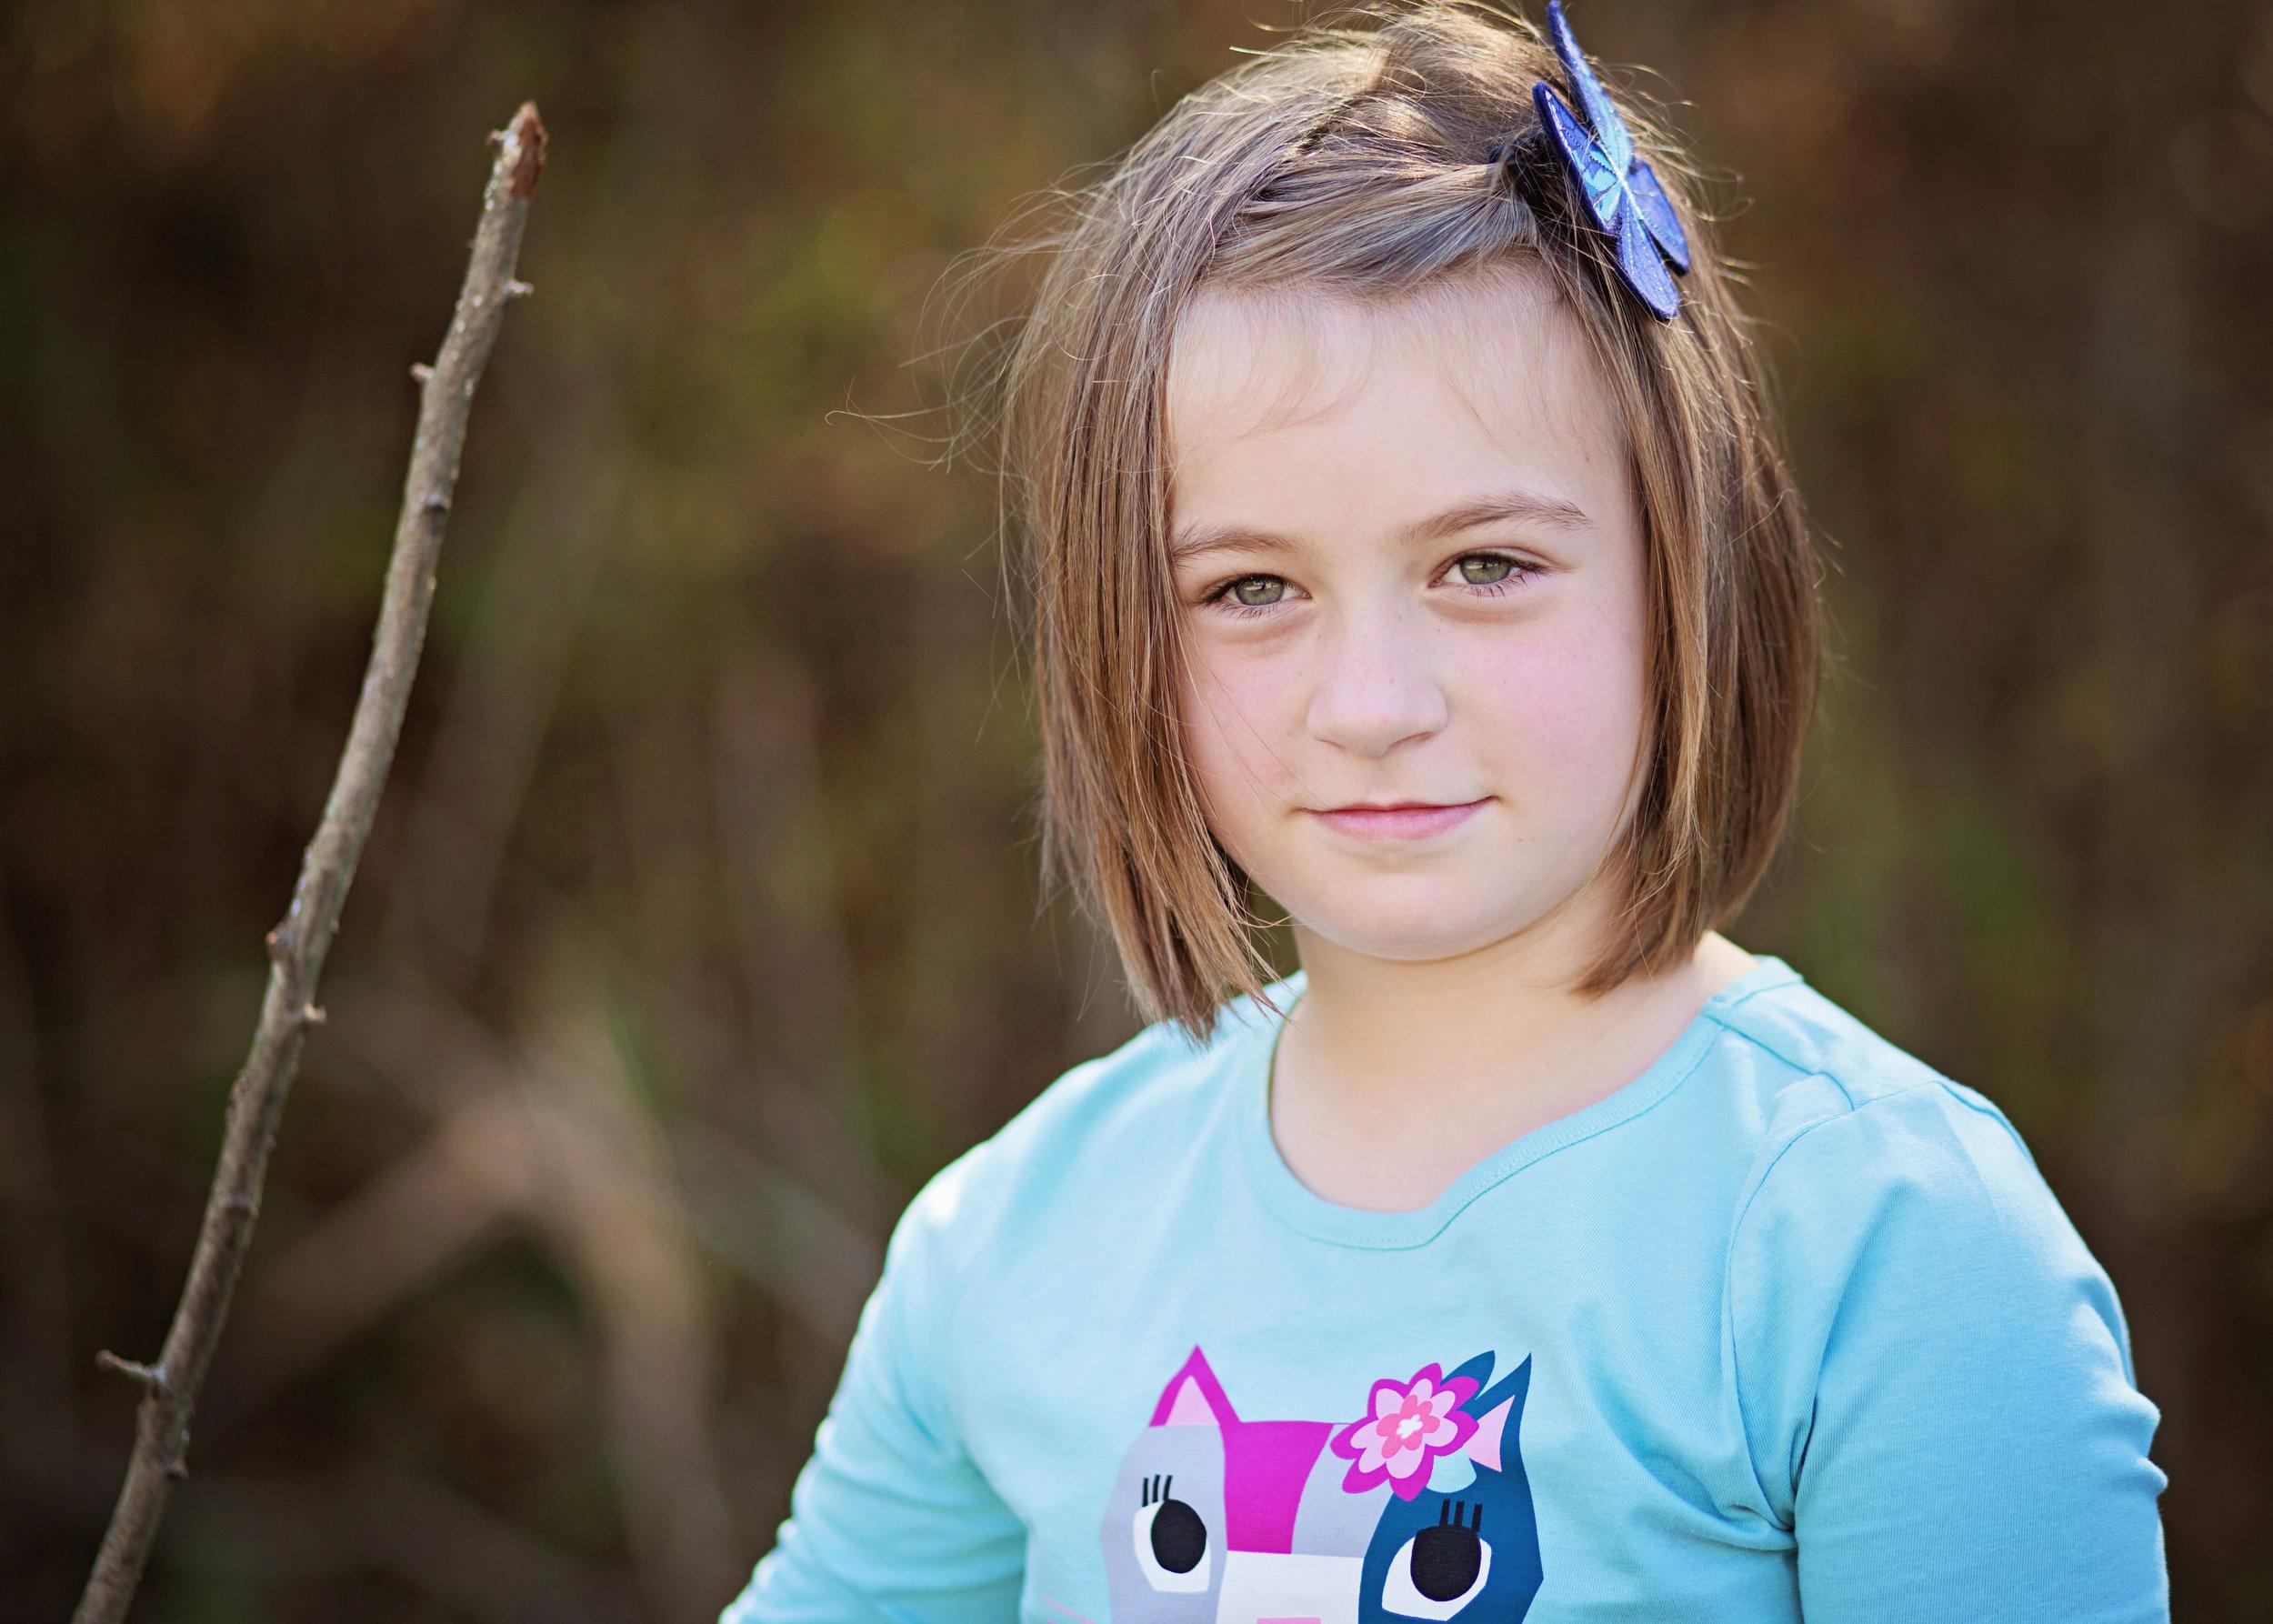 Childrens Photographer | Kelly Rhoades Photography